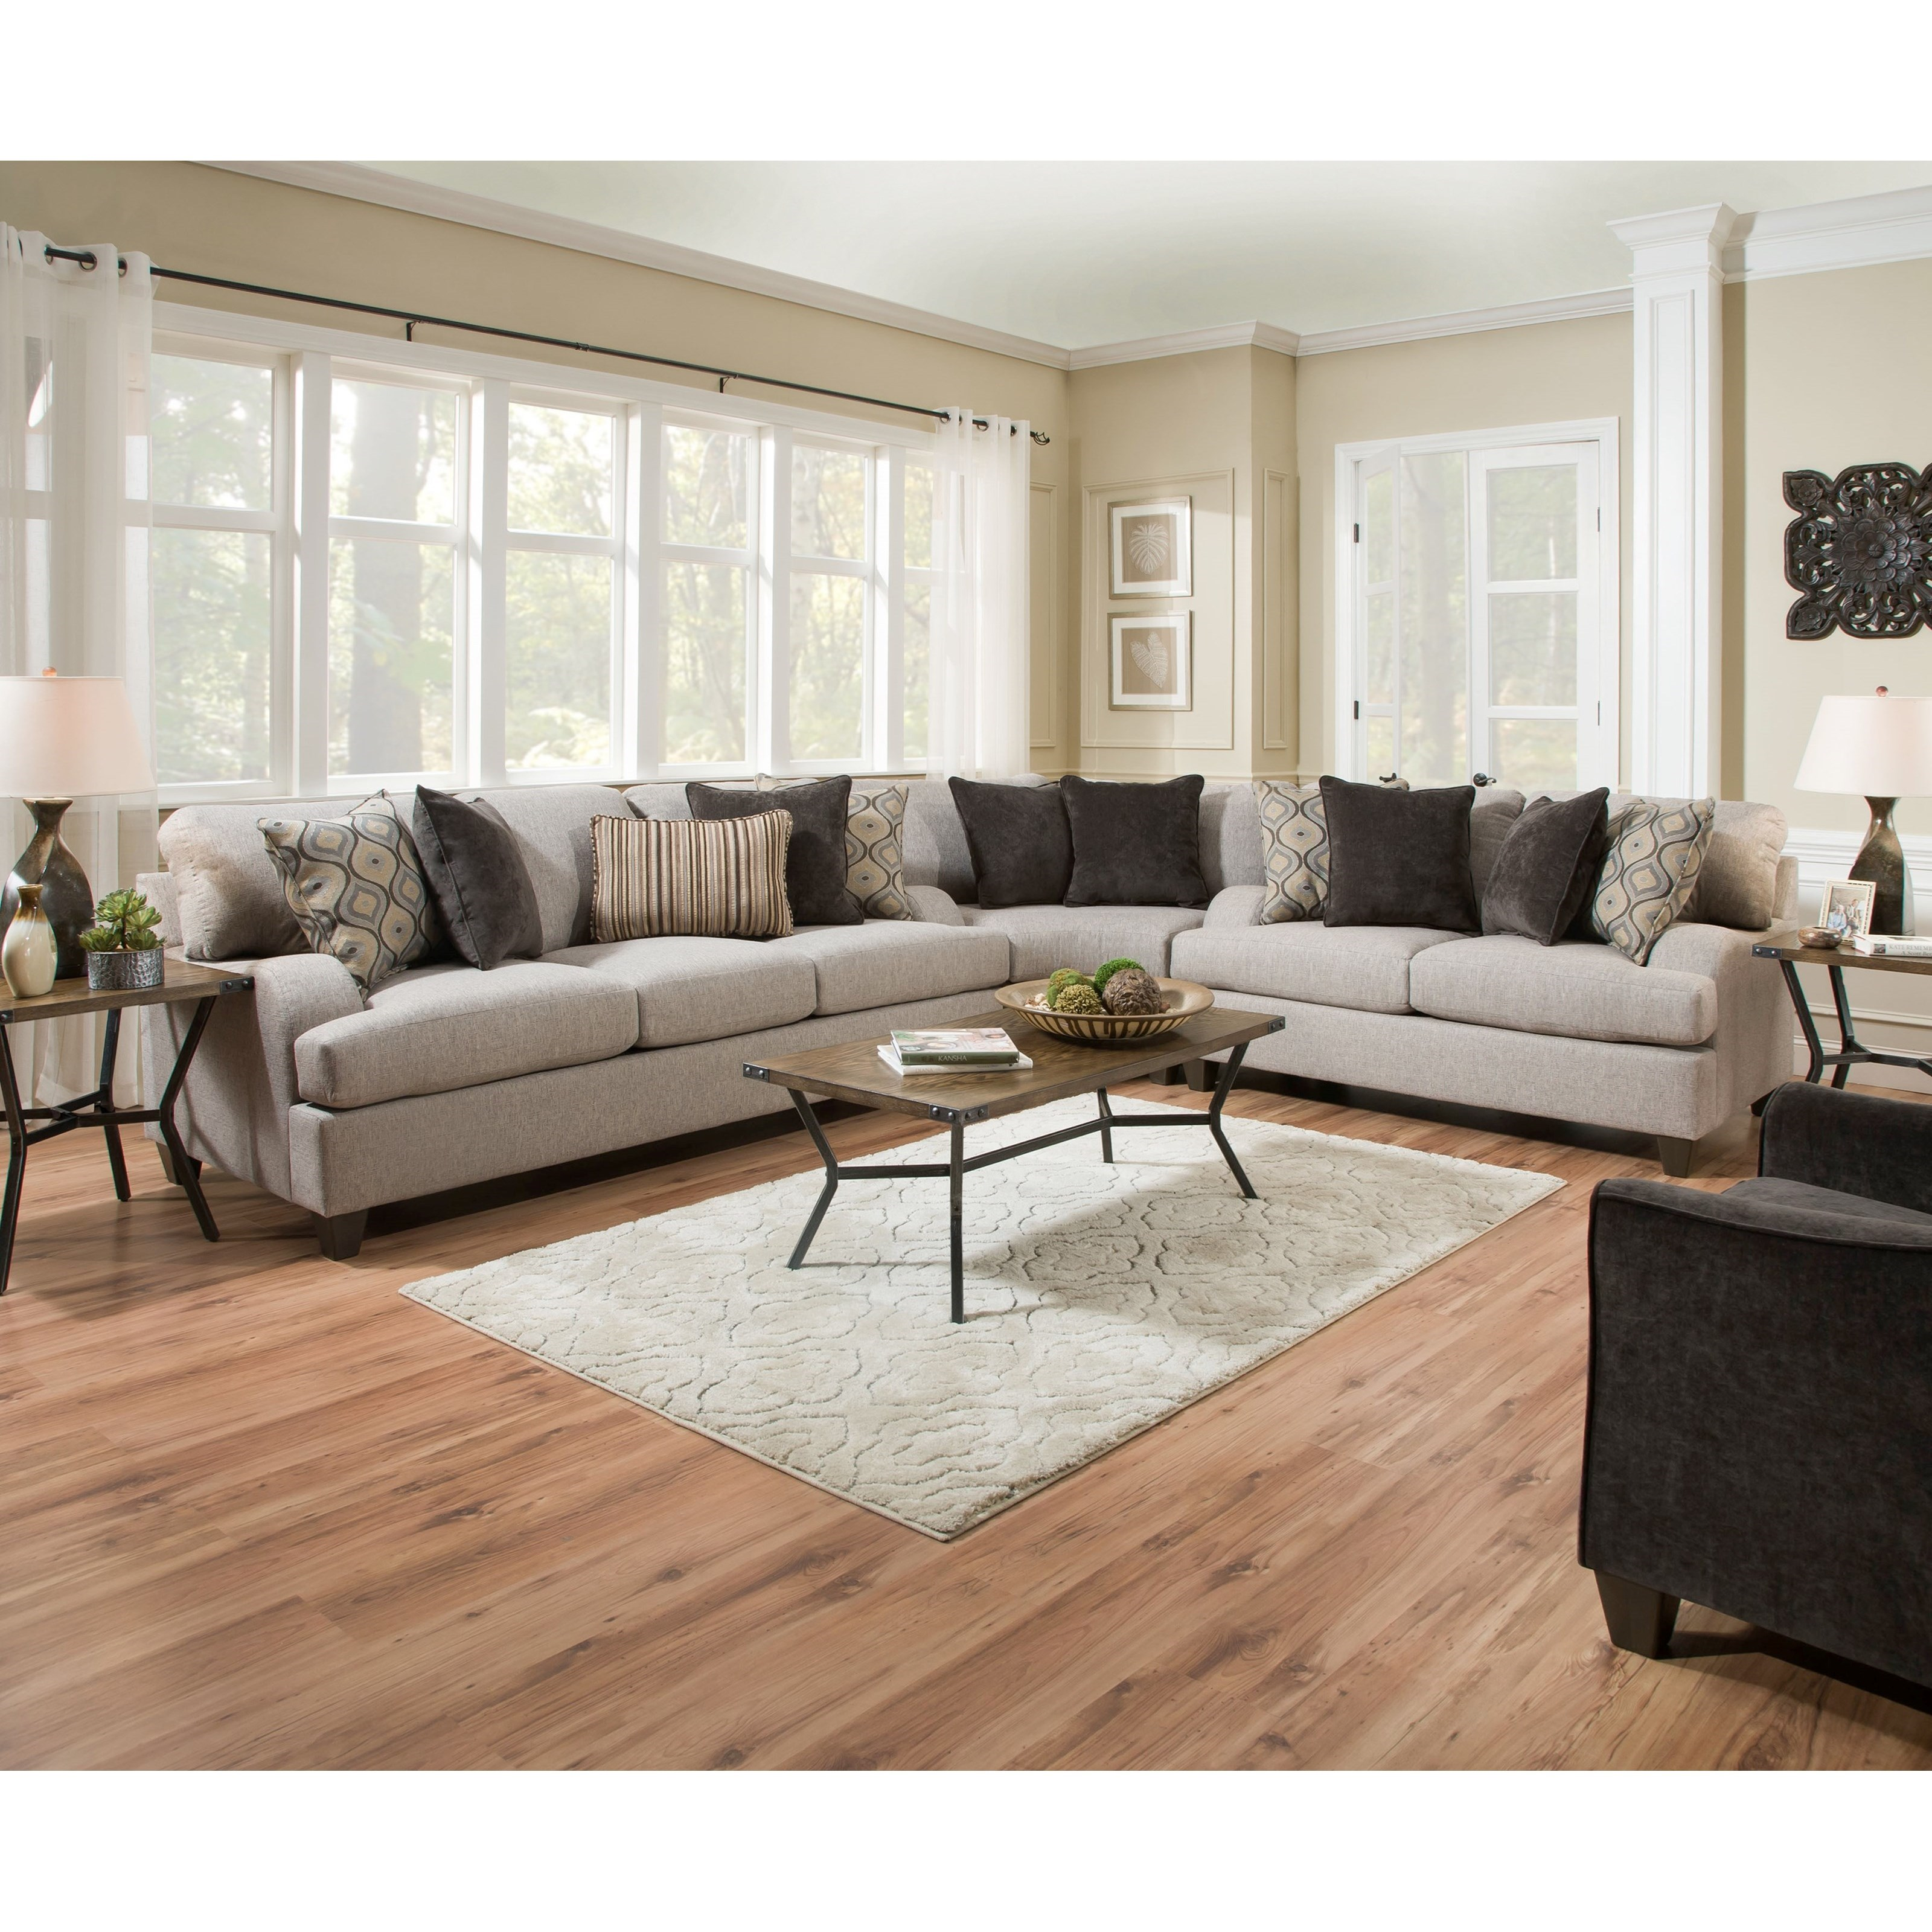 Cantia Sectional Sofa by Acme Furniture at Carolina Direct